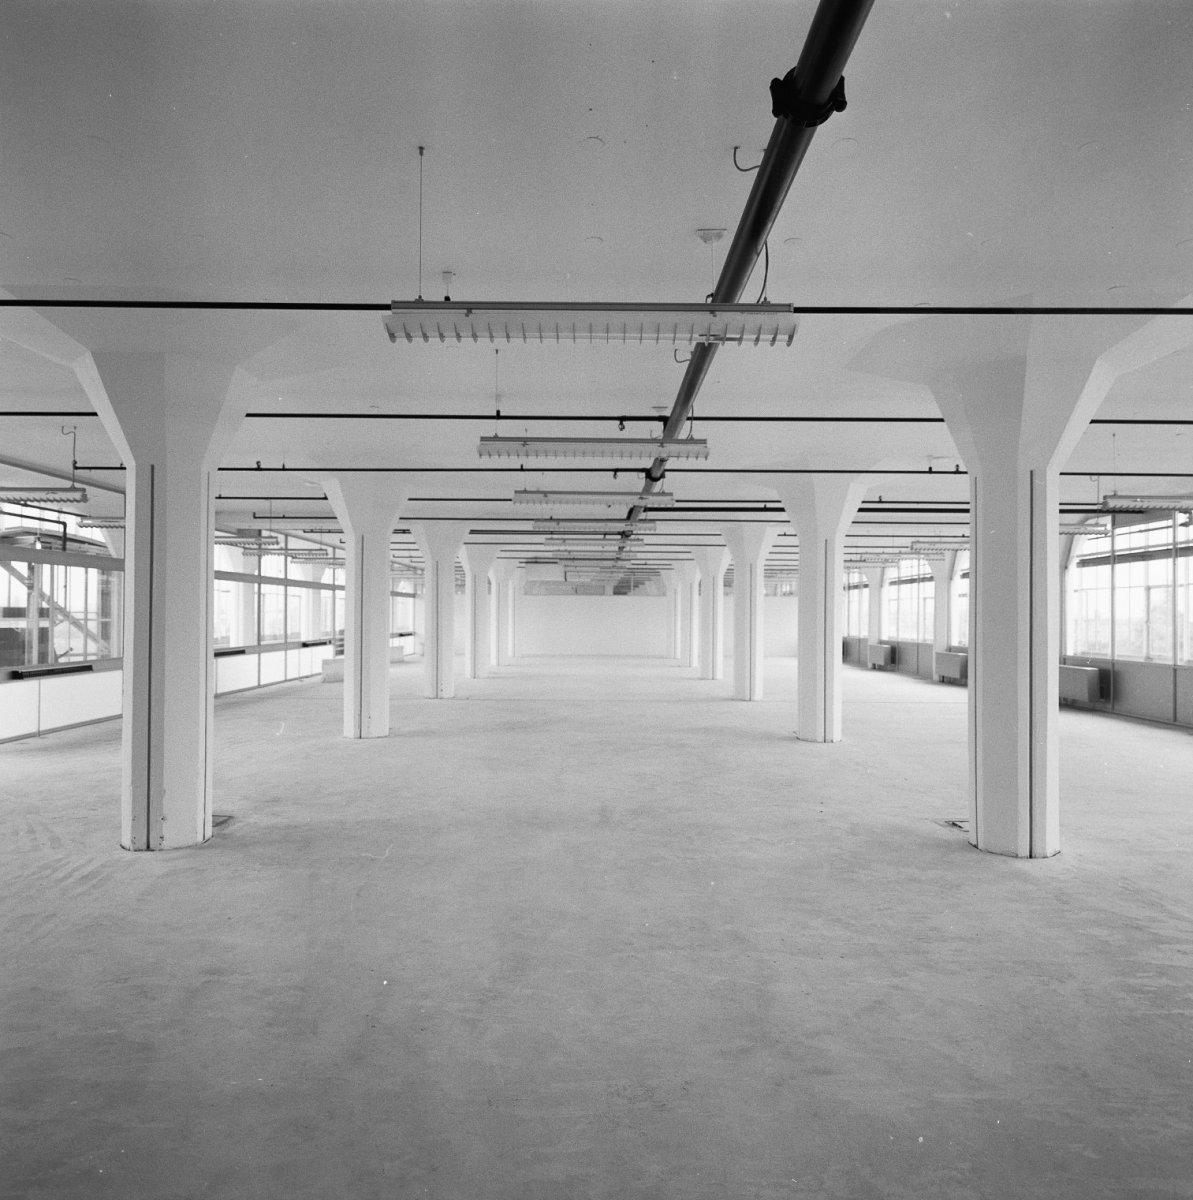 File interieur opgeknapte lege ruimte verlichting for Interieur rotterdam